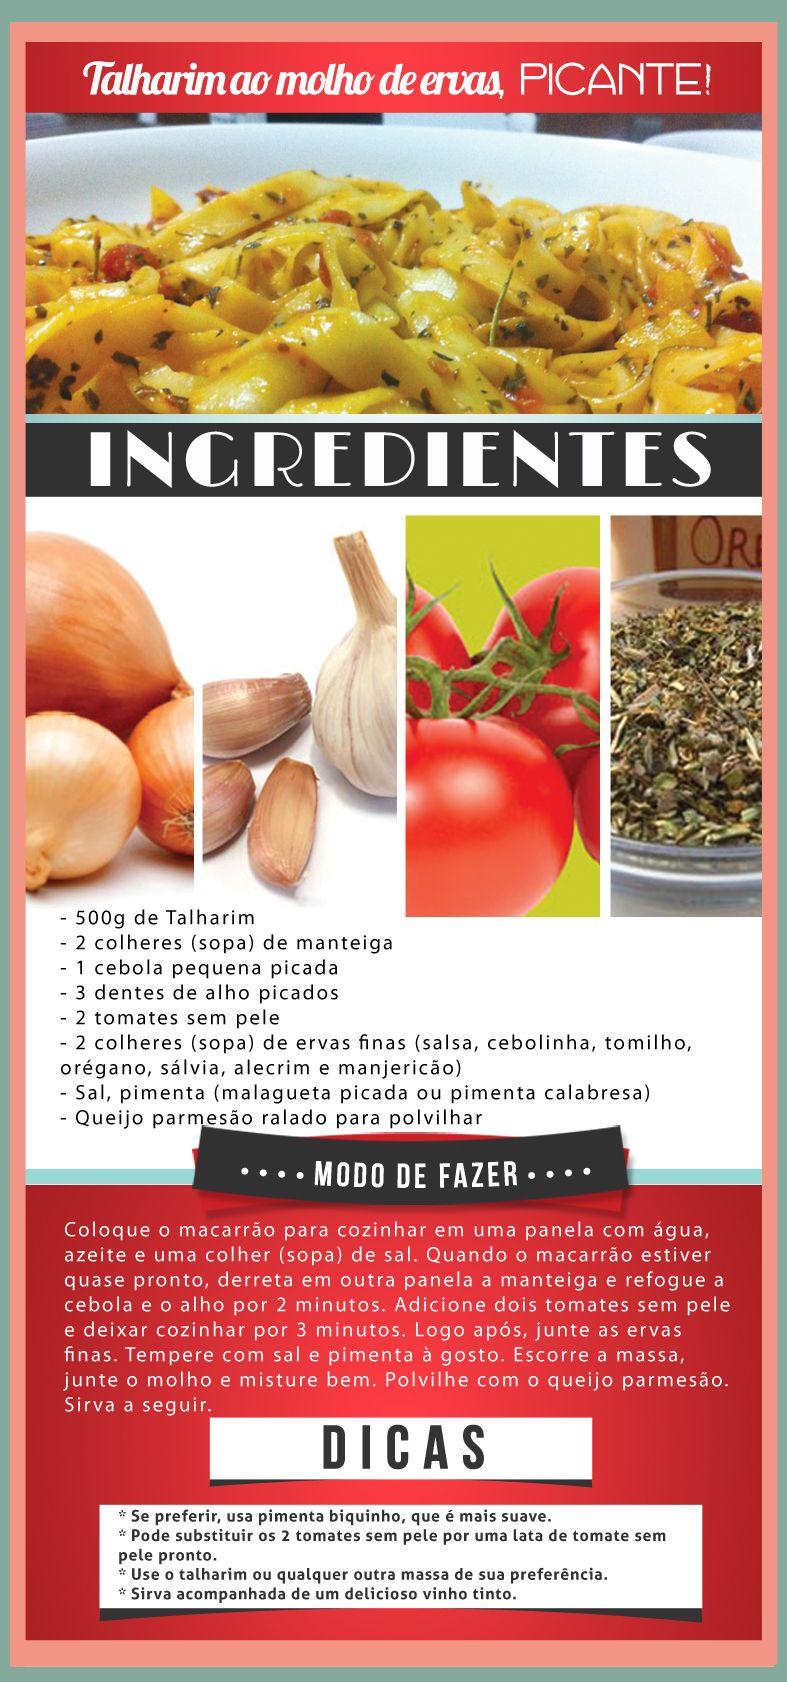 Talharim #talharim #receita #pimenta #picante #sabores #comida #food #saude #bemestar #alimentos #nutricao